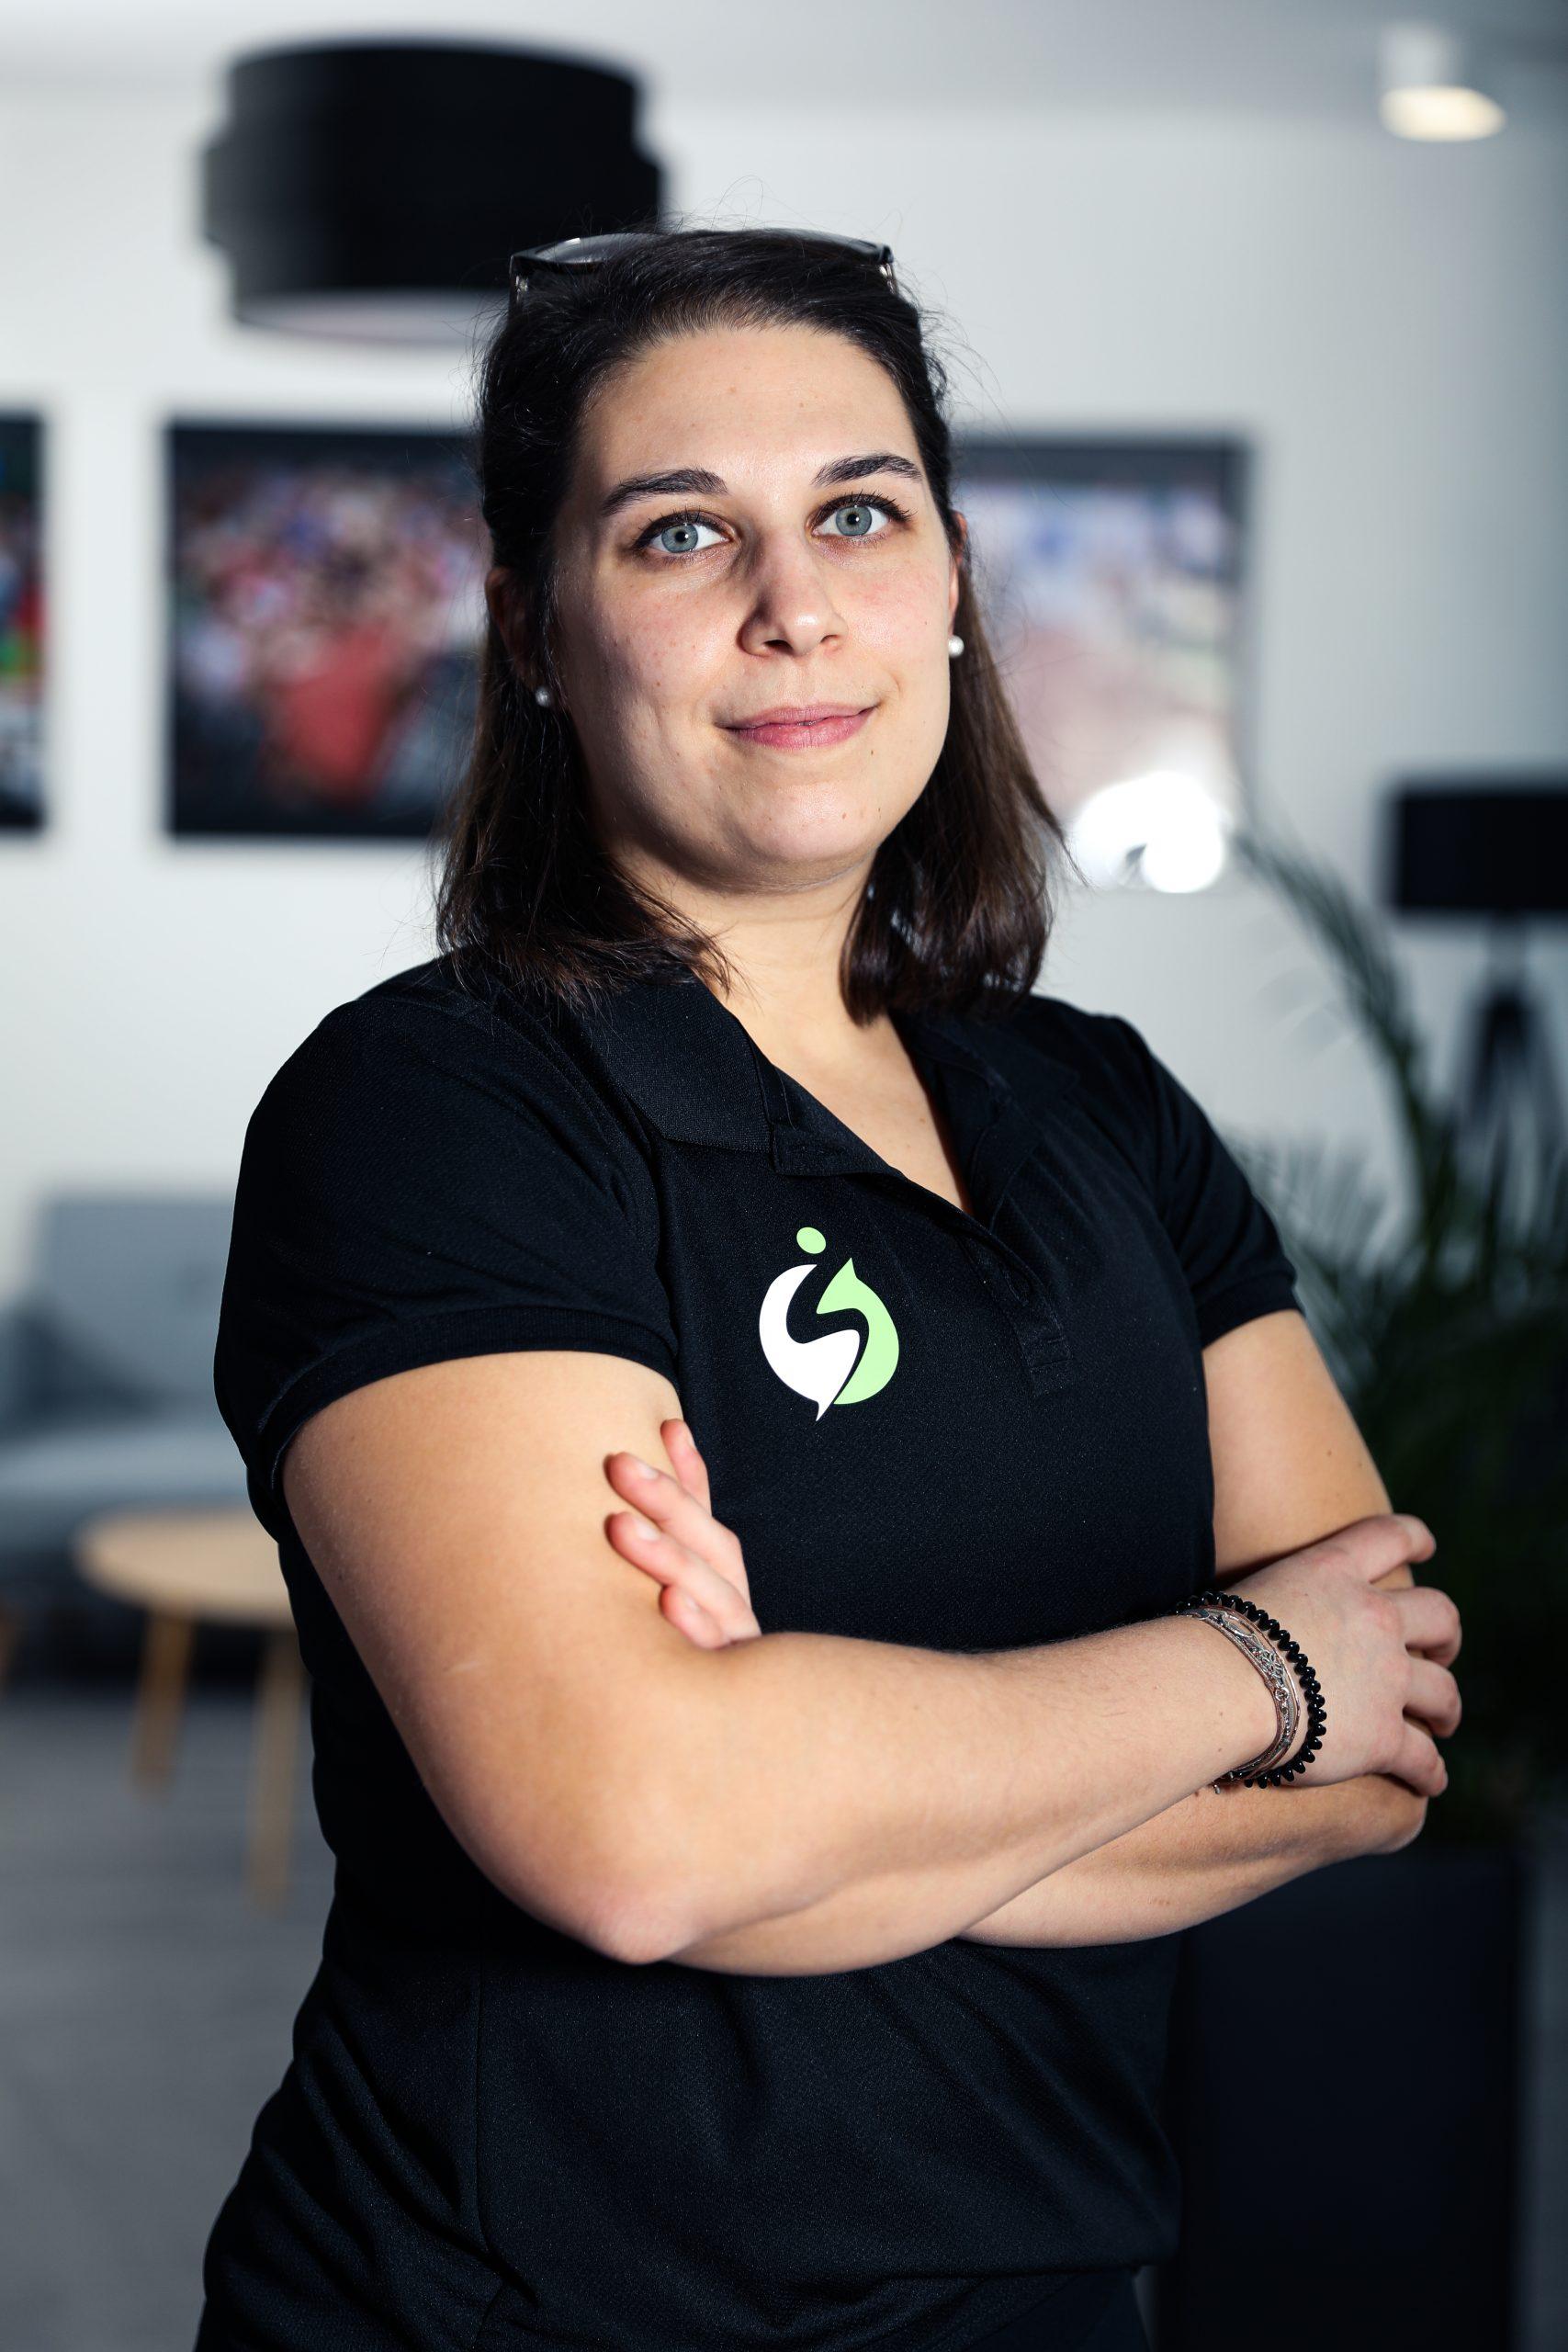 Nathalie Neumann